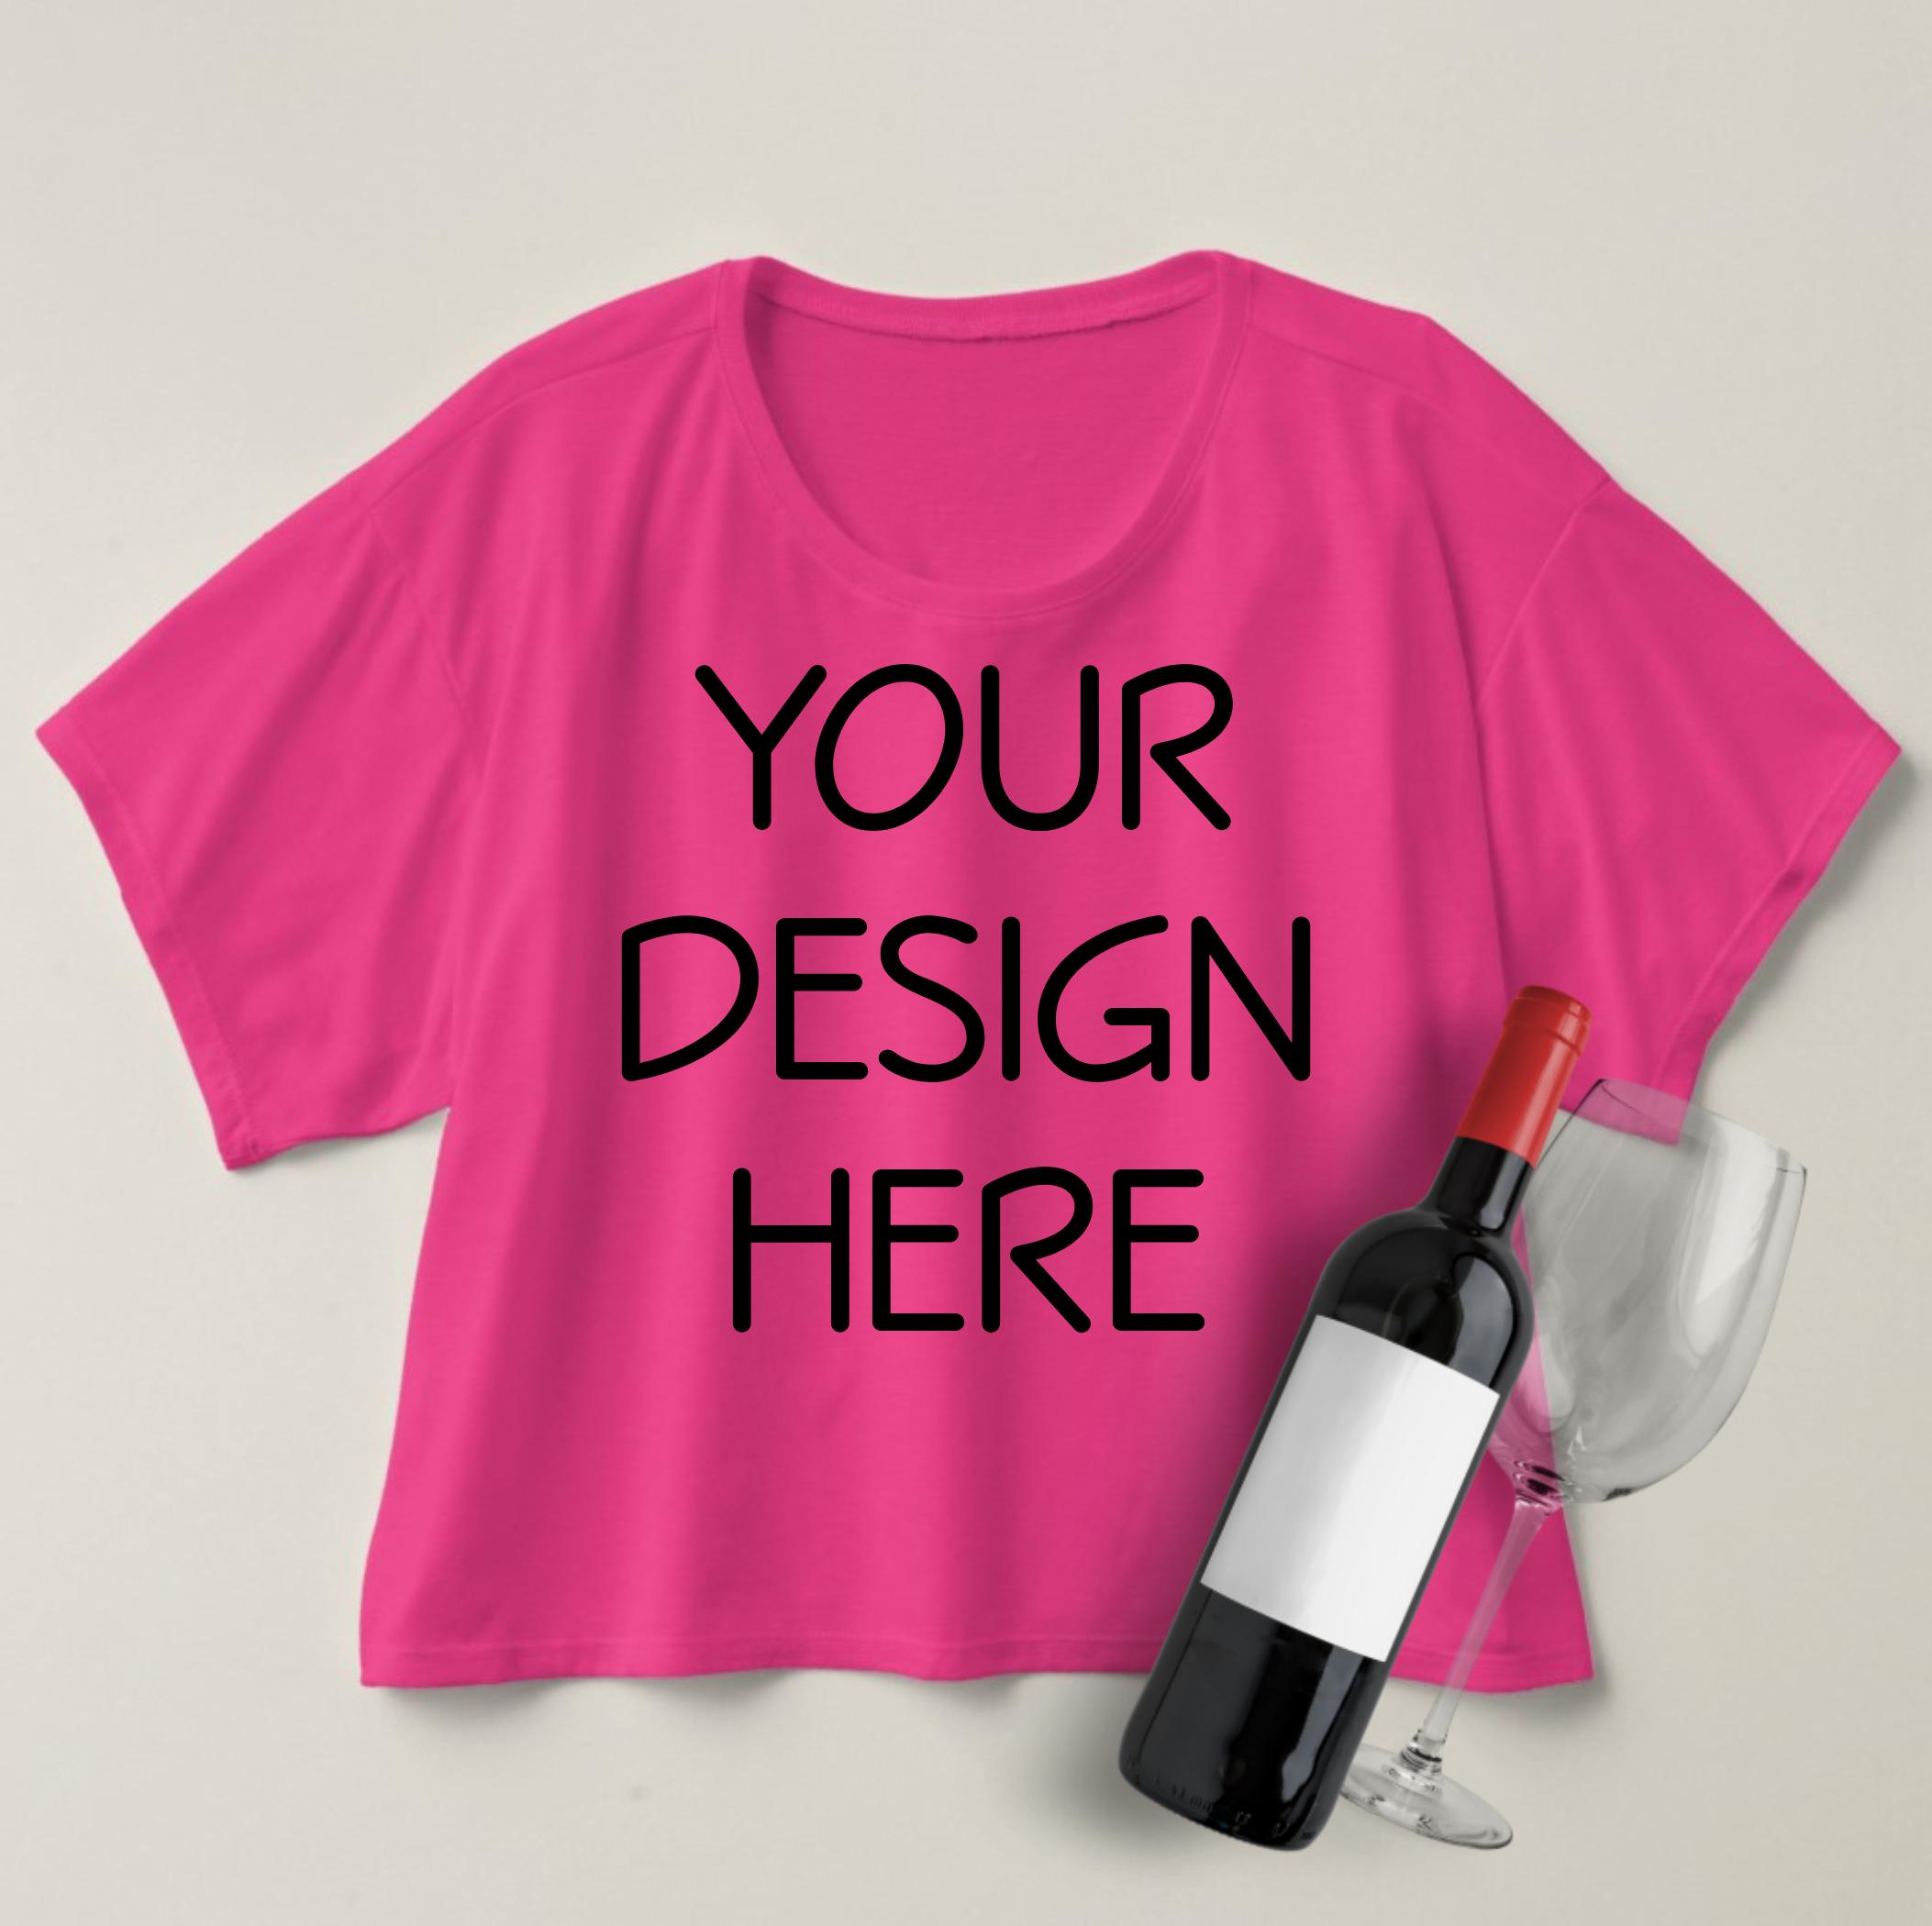 Boxy Crop Top T-shirt Mockups - 4 example image 3